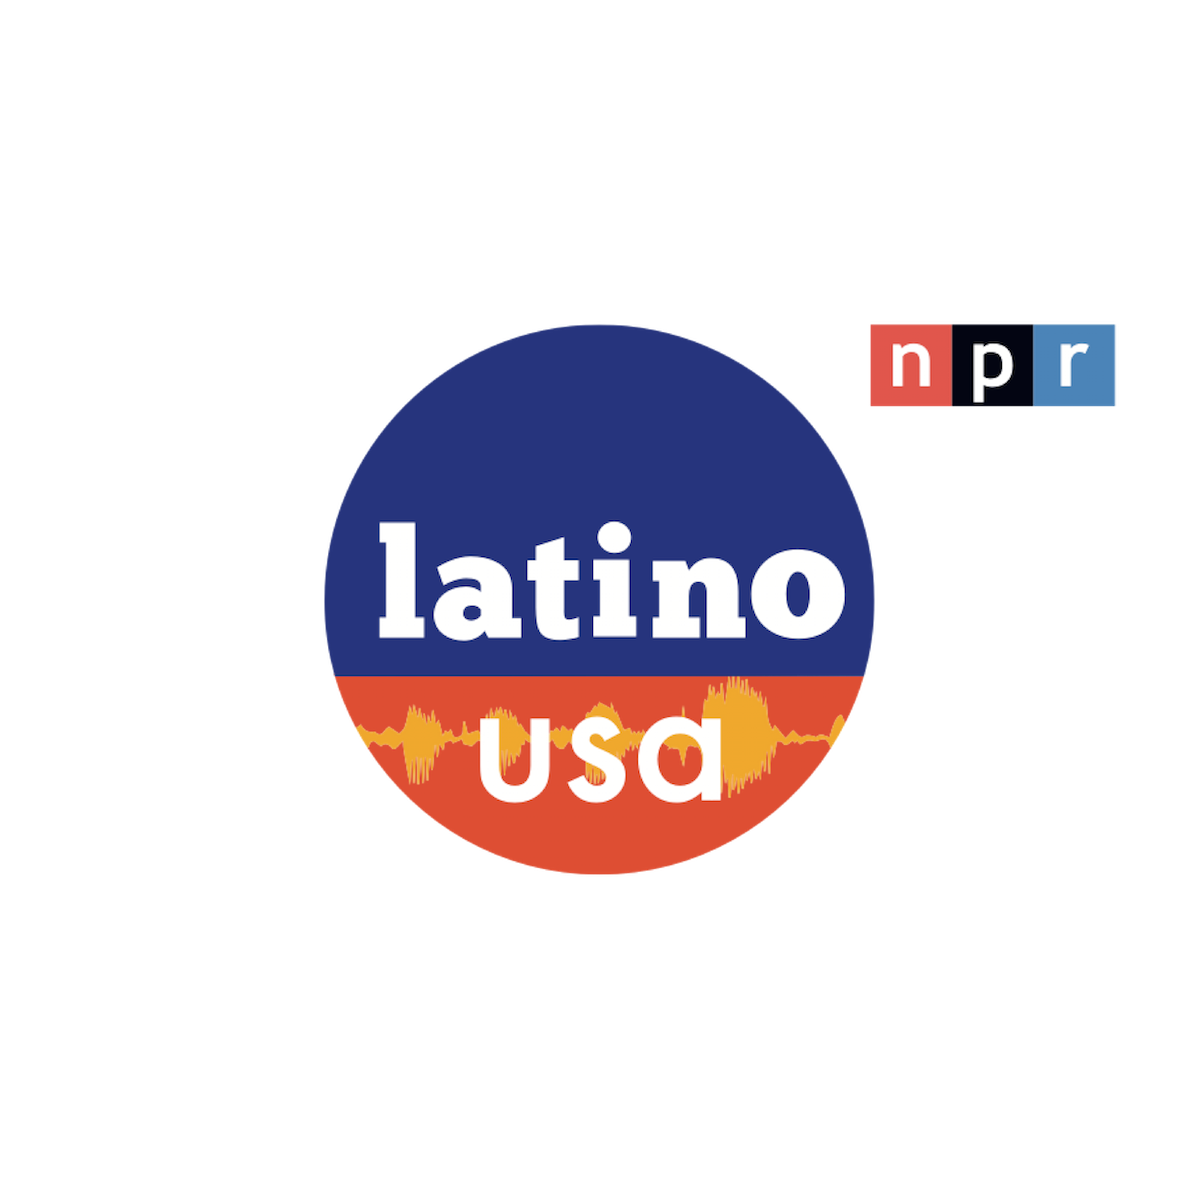 Hispandering for NPR's Latino USA -